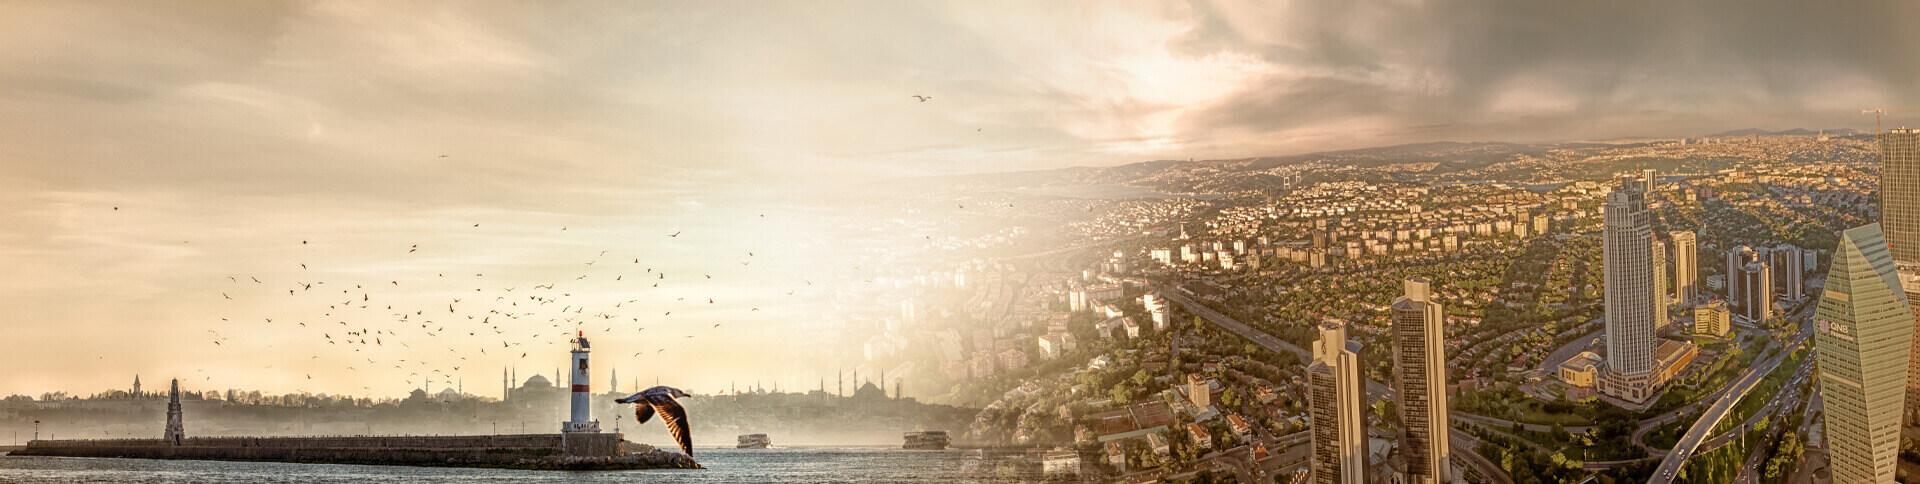 MELARES   عقارات اسطنبول - عقارات تركيا - الجنسية التركية